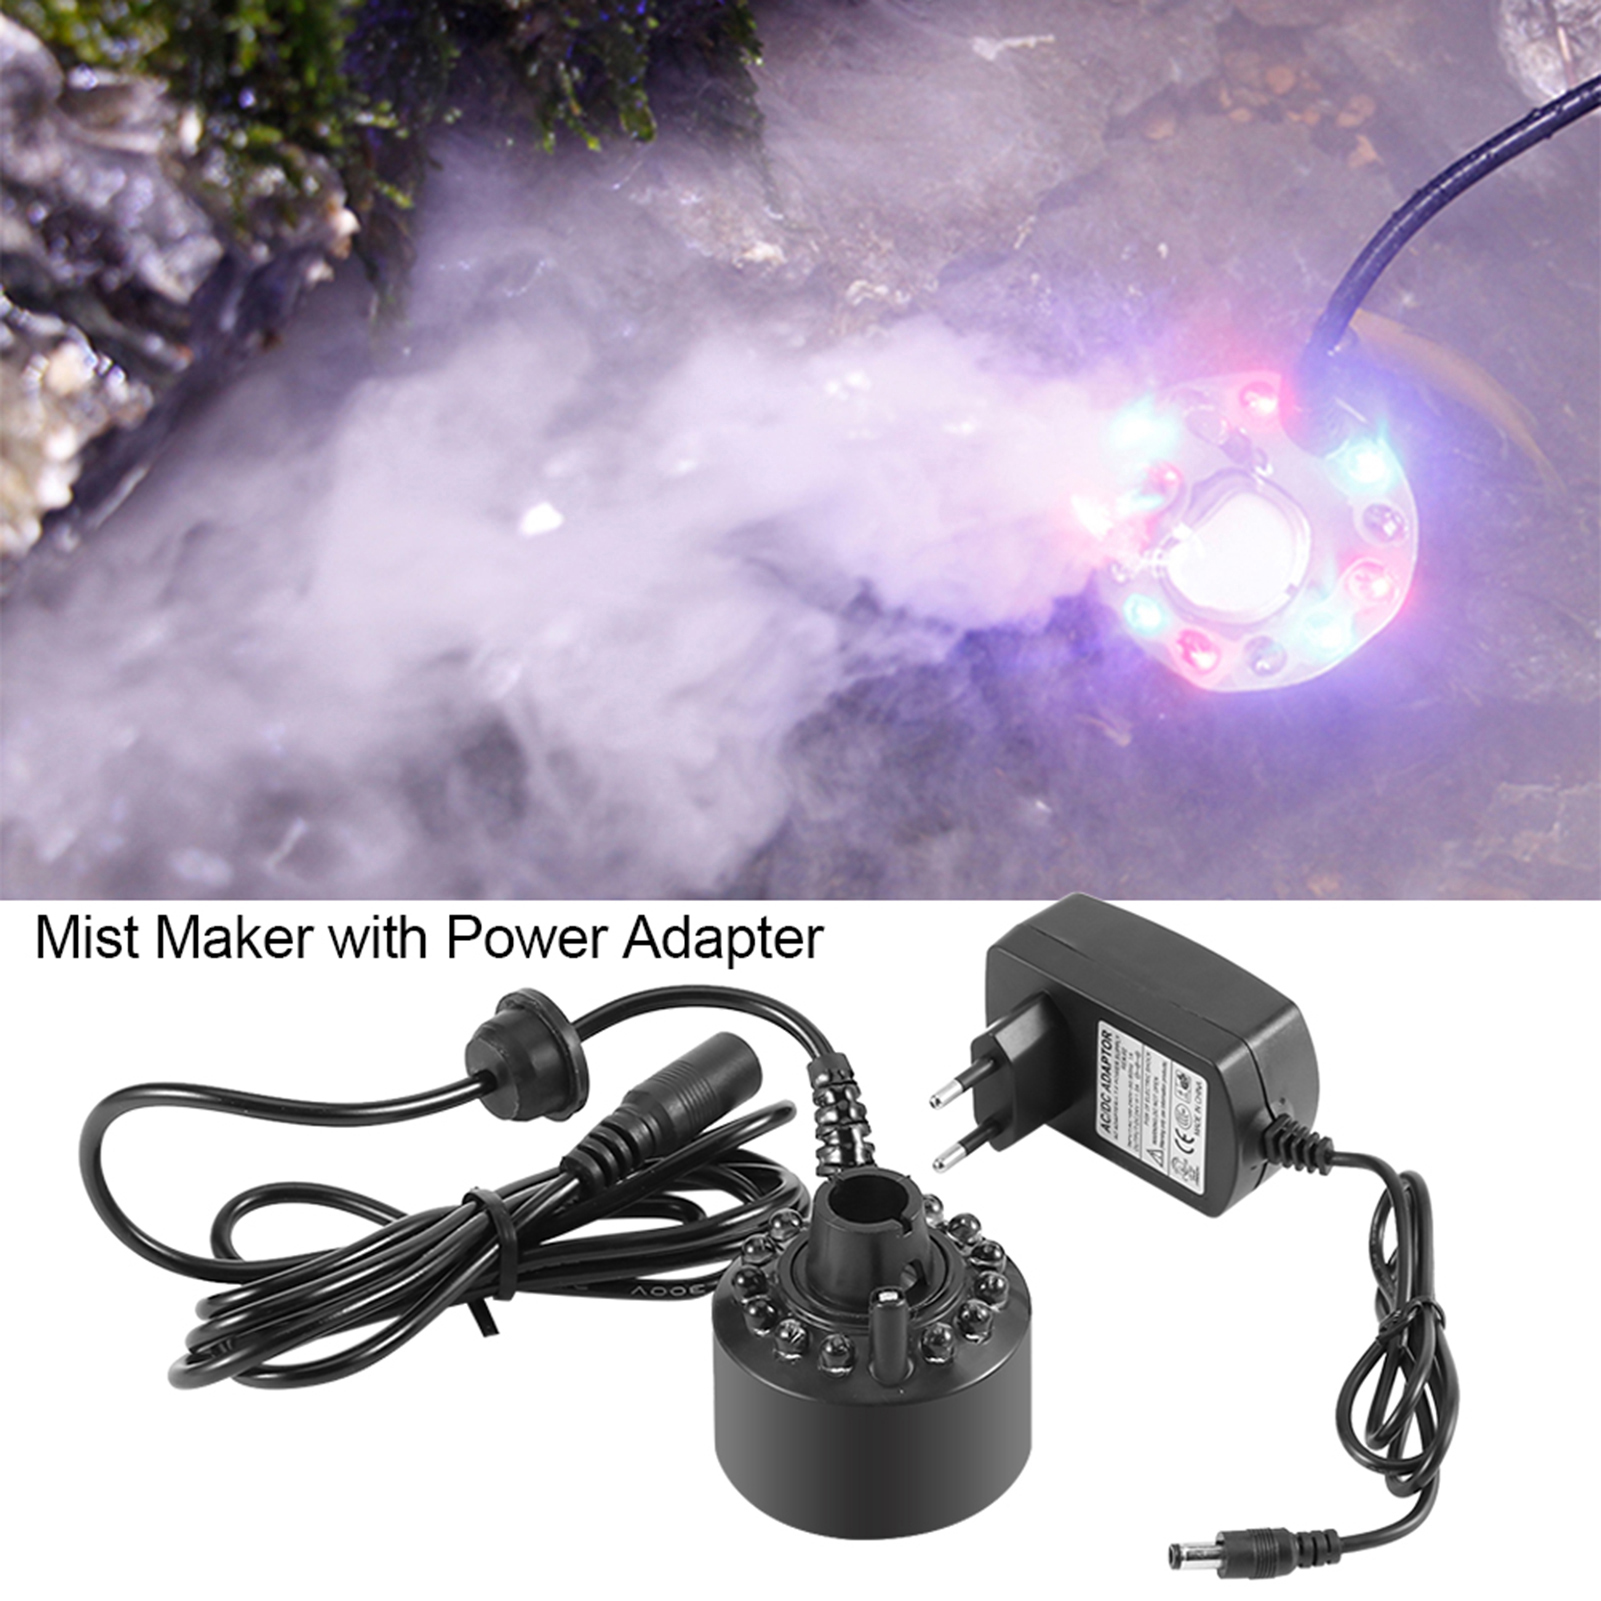 Hot Ultrasonic Mist Maker Fogger Water Fountain Pond Atomizer Air Humidifier HG